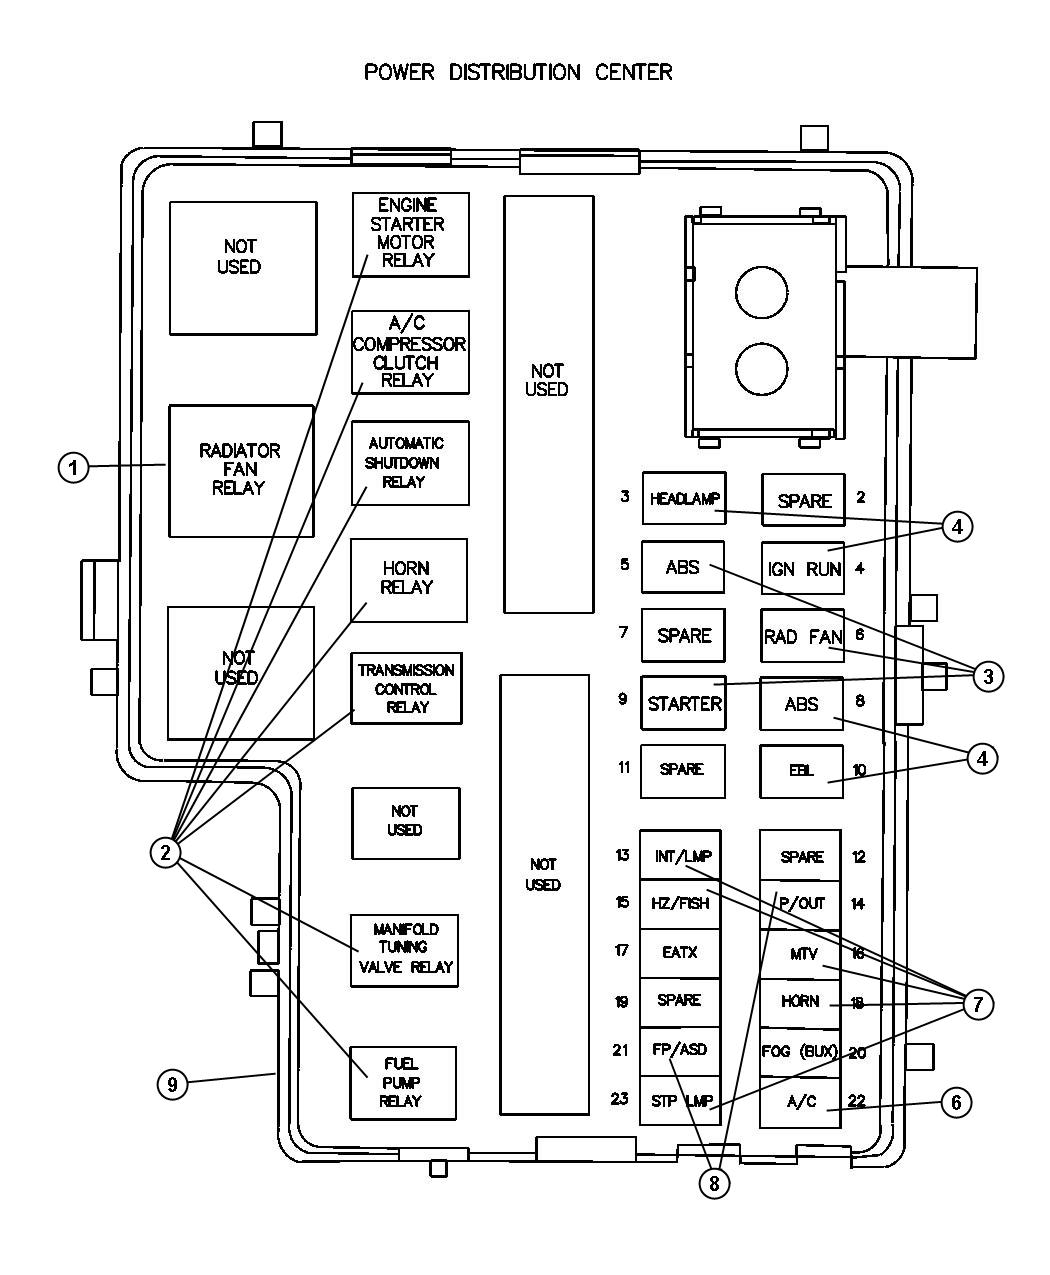 2004 dodge neon power distribution center relays fuses. Black Bedroom Furniture Sets. Home Design Ideas